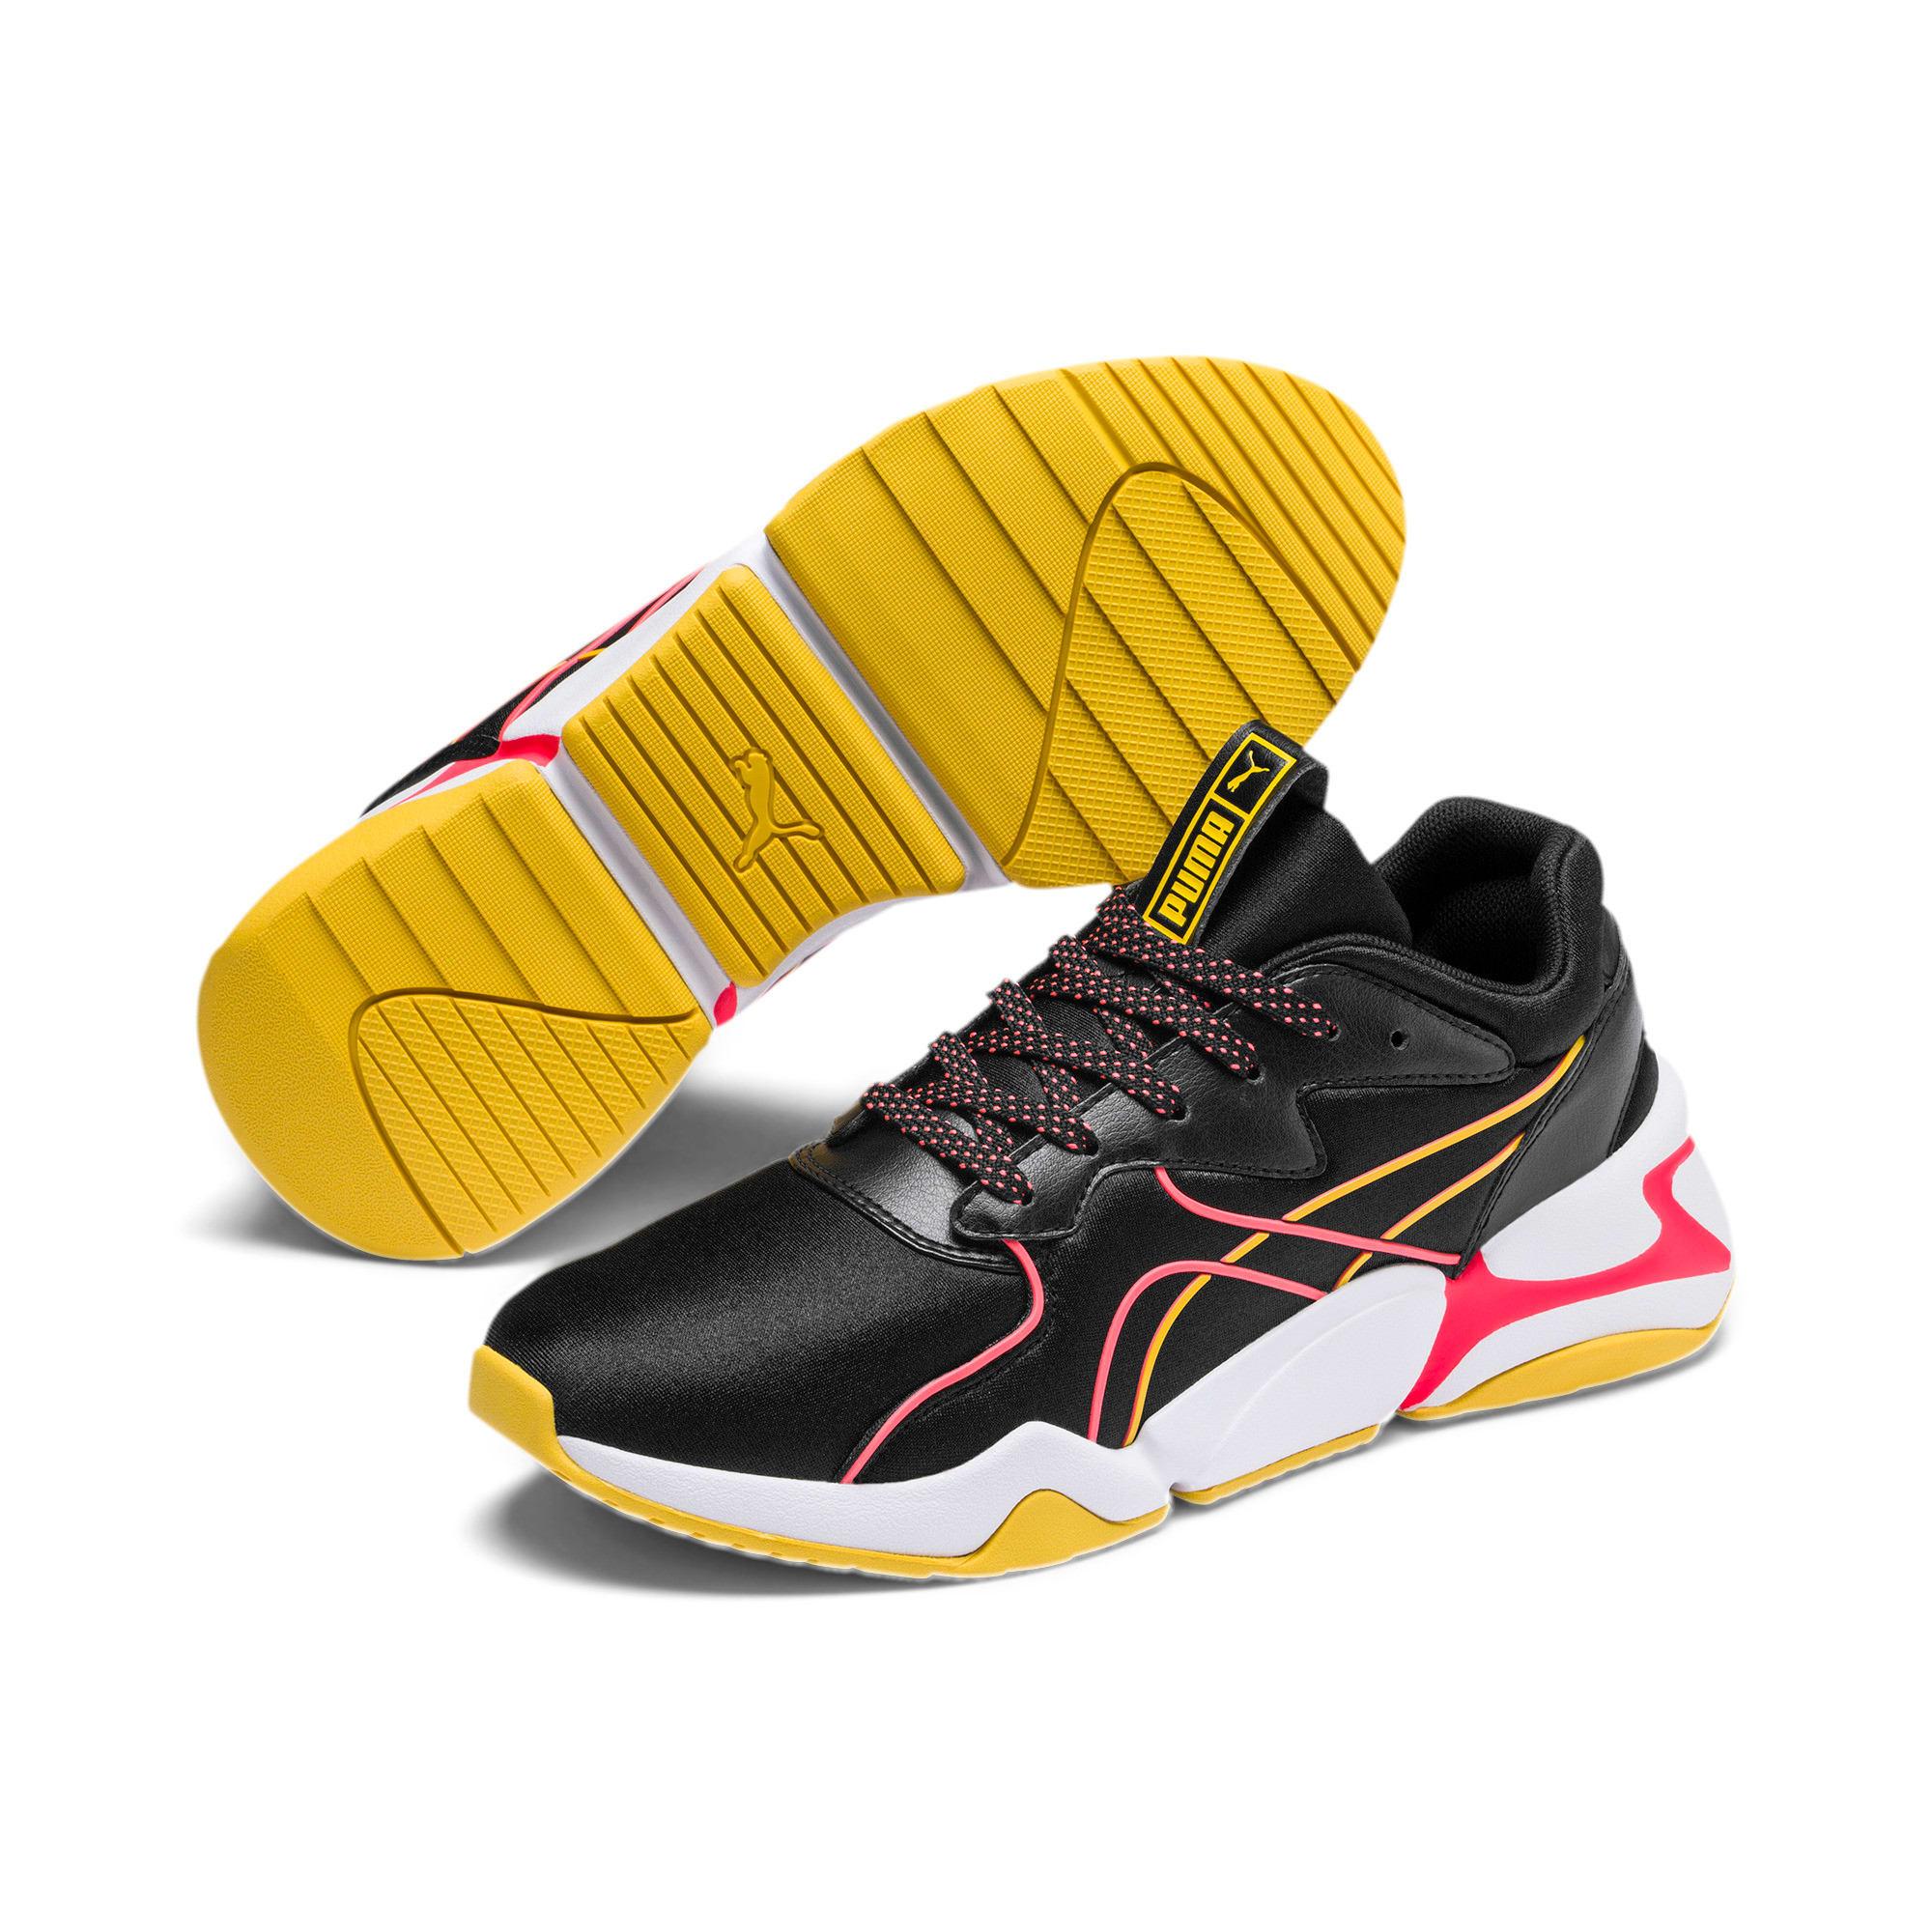 Thumbnail 3 of Nova Hypertech Women's Sneakers, Puma Black, medium